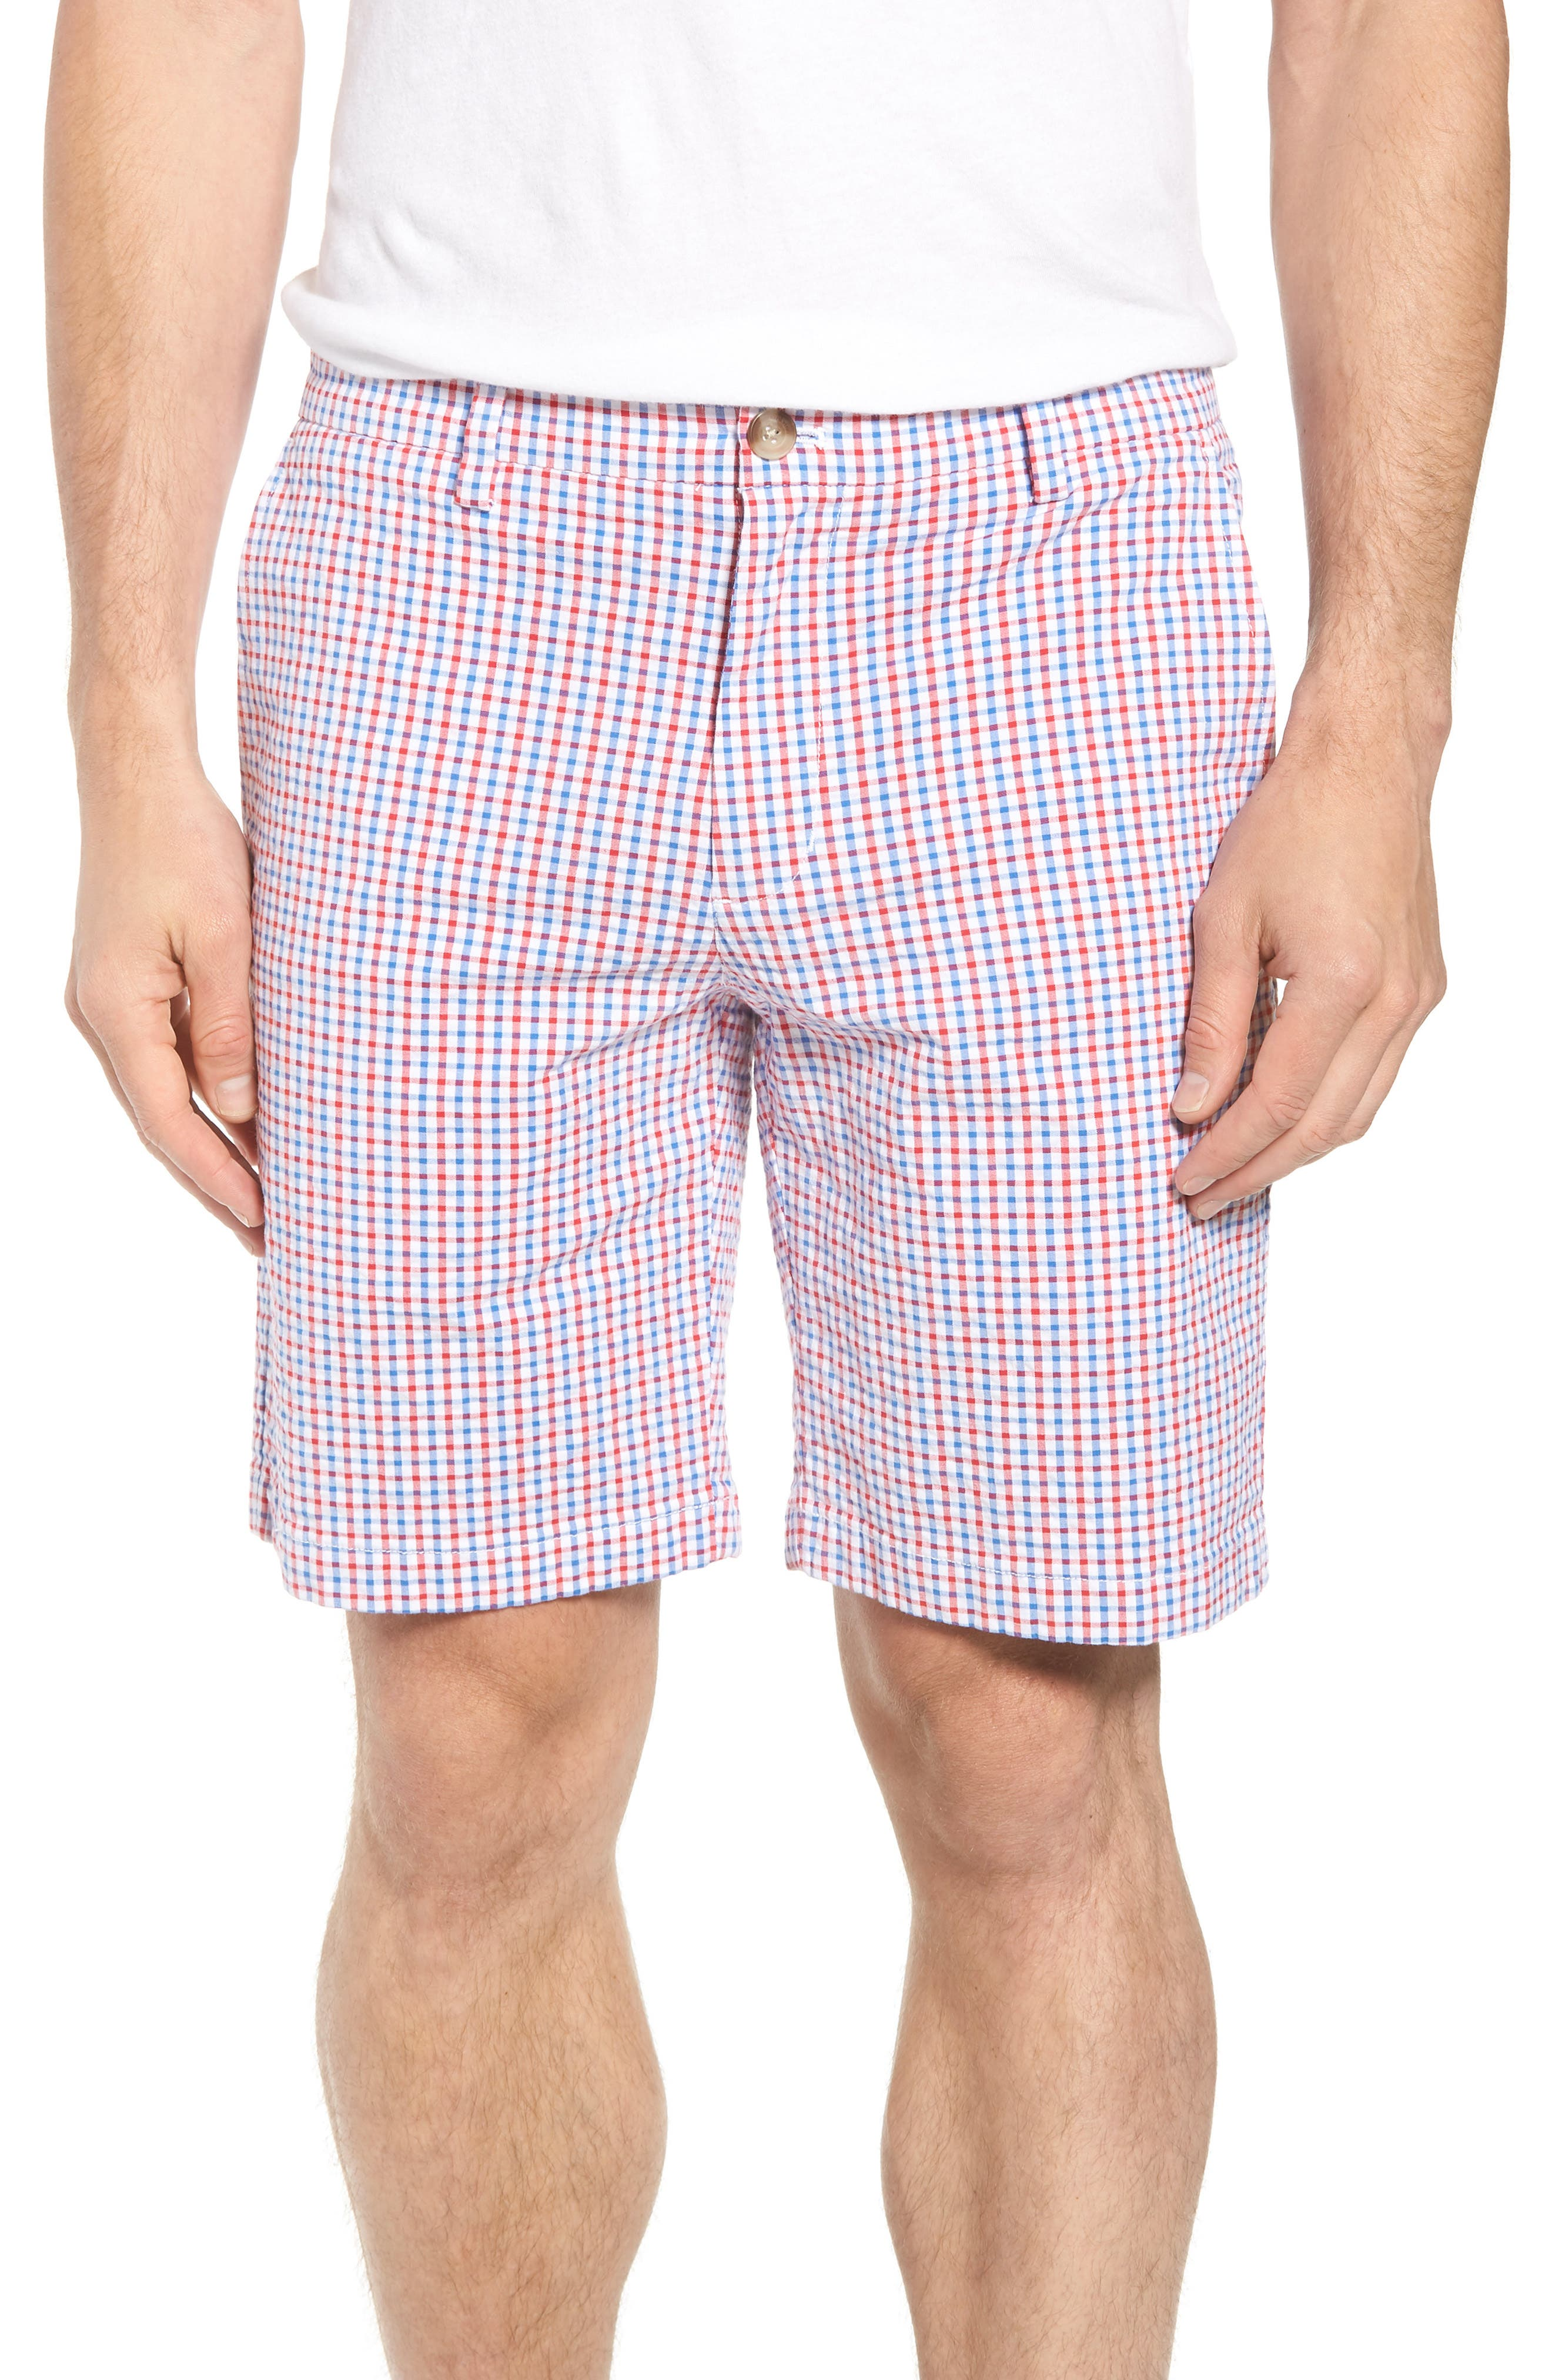 Gingham Seersucker Stretch Breaker Shorts,                             Main thumbnail 1, color,                             427